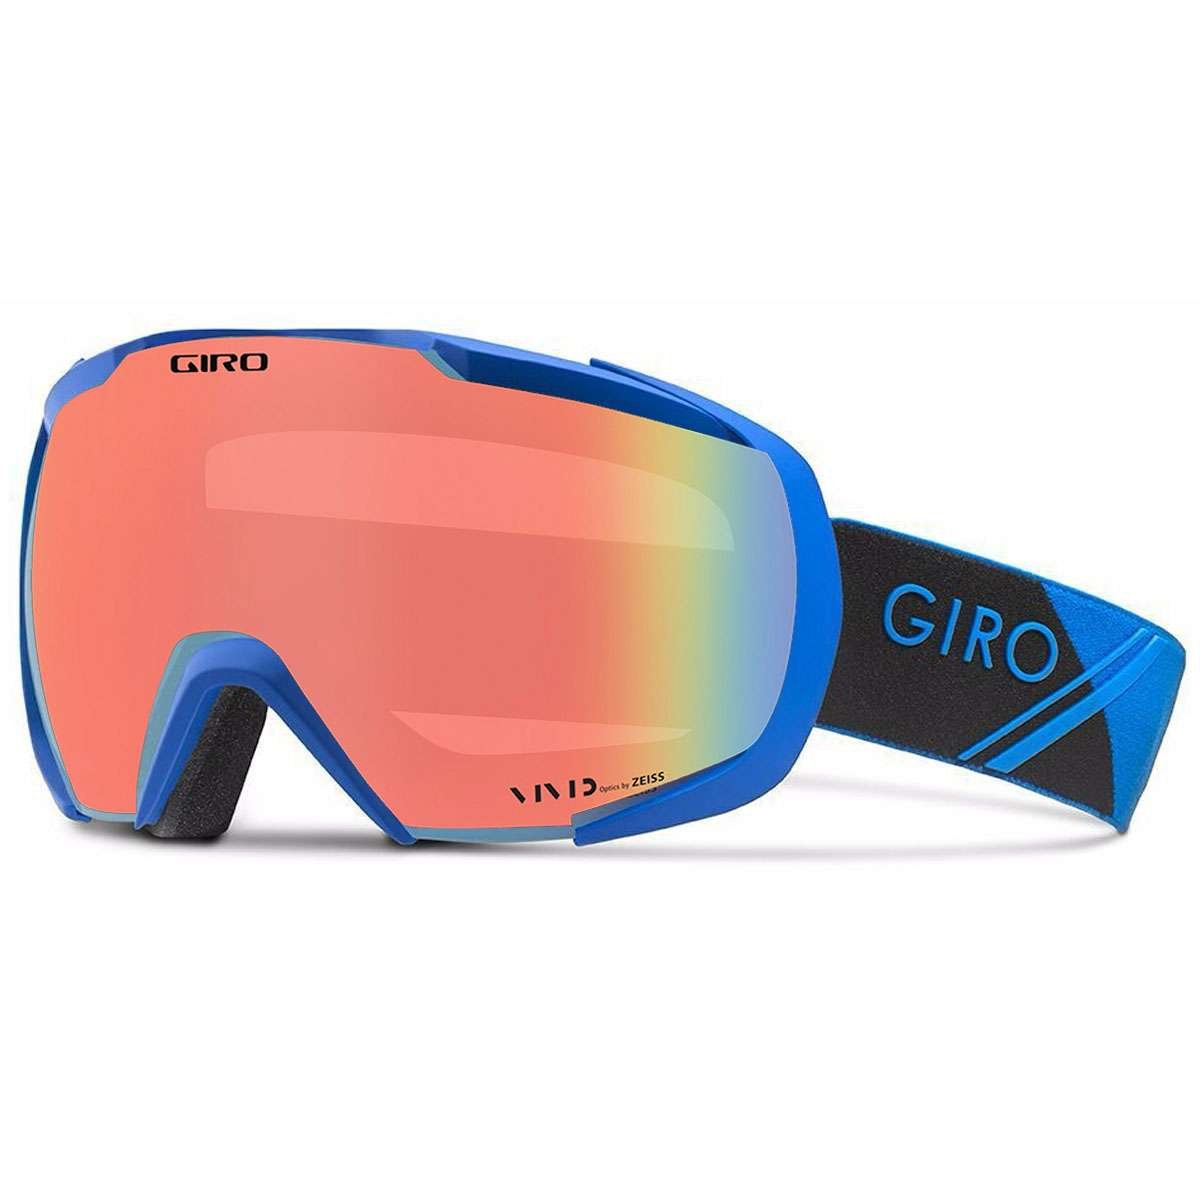 Giro Onset雪ゴーグル – Men 's  Blue Sporttech B07341S3HP